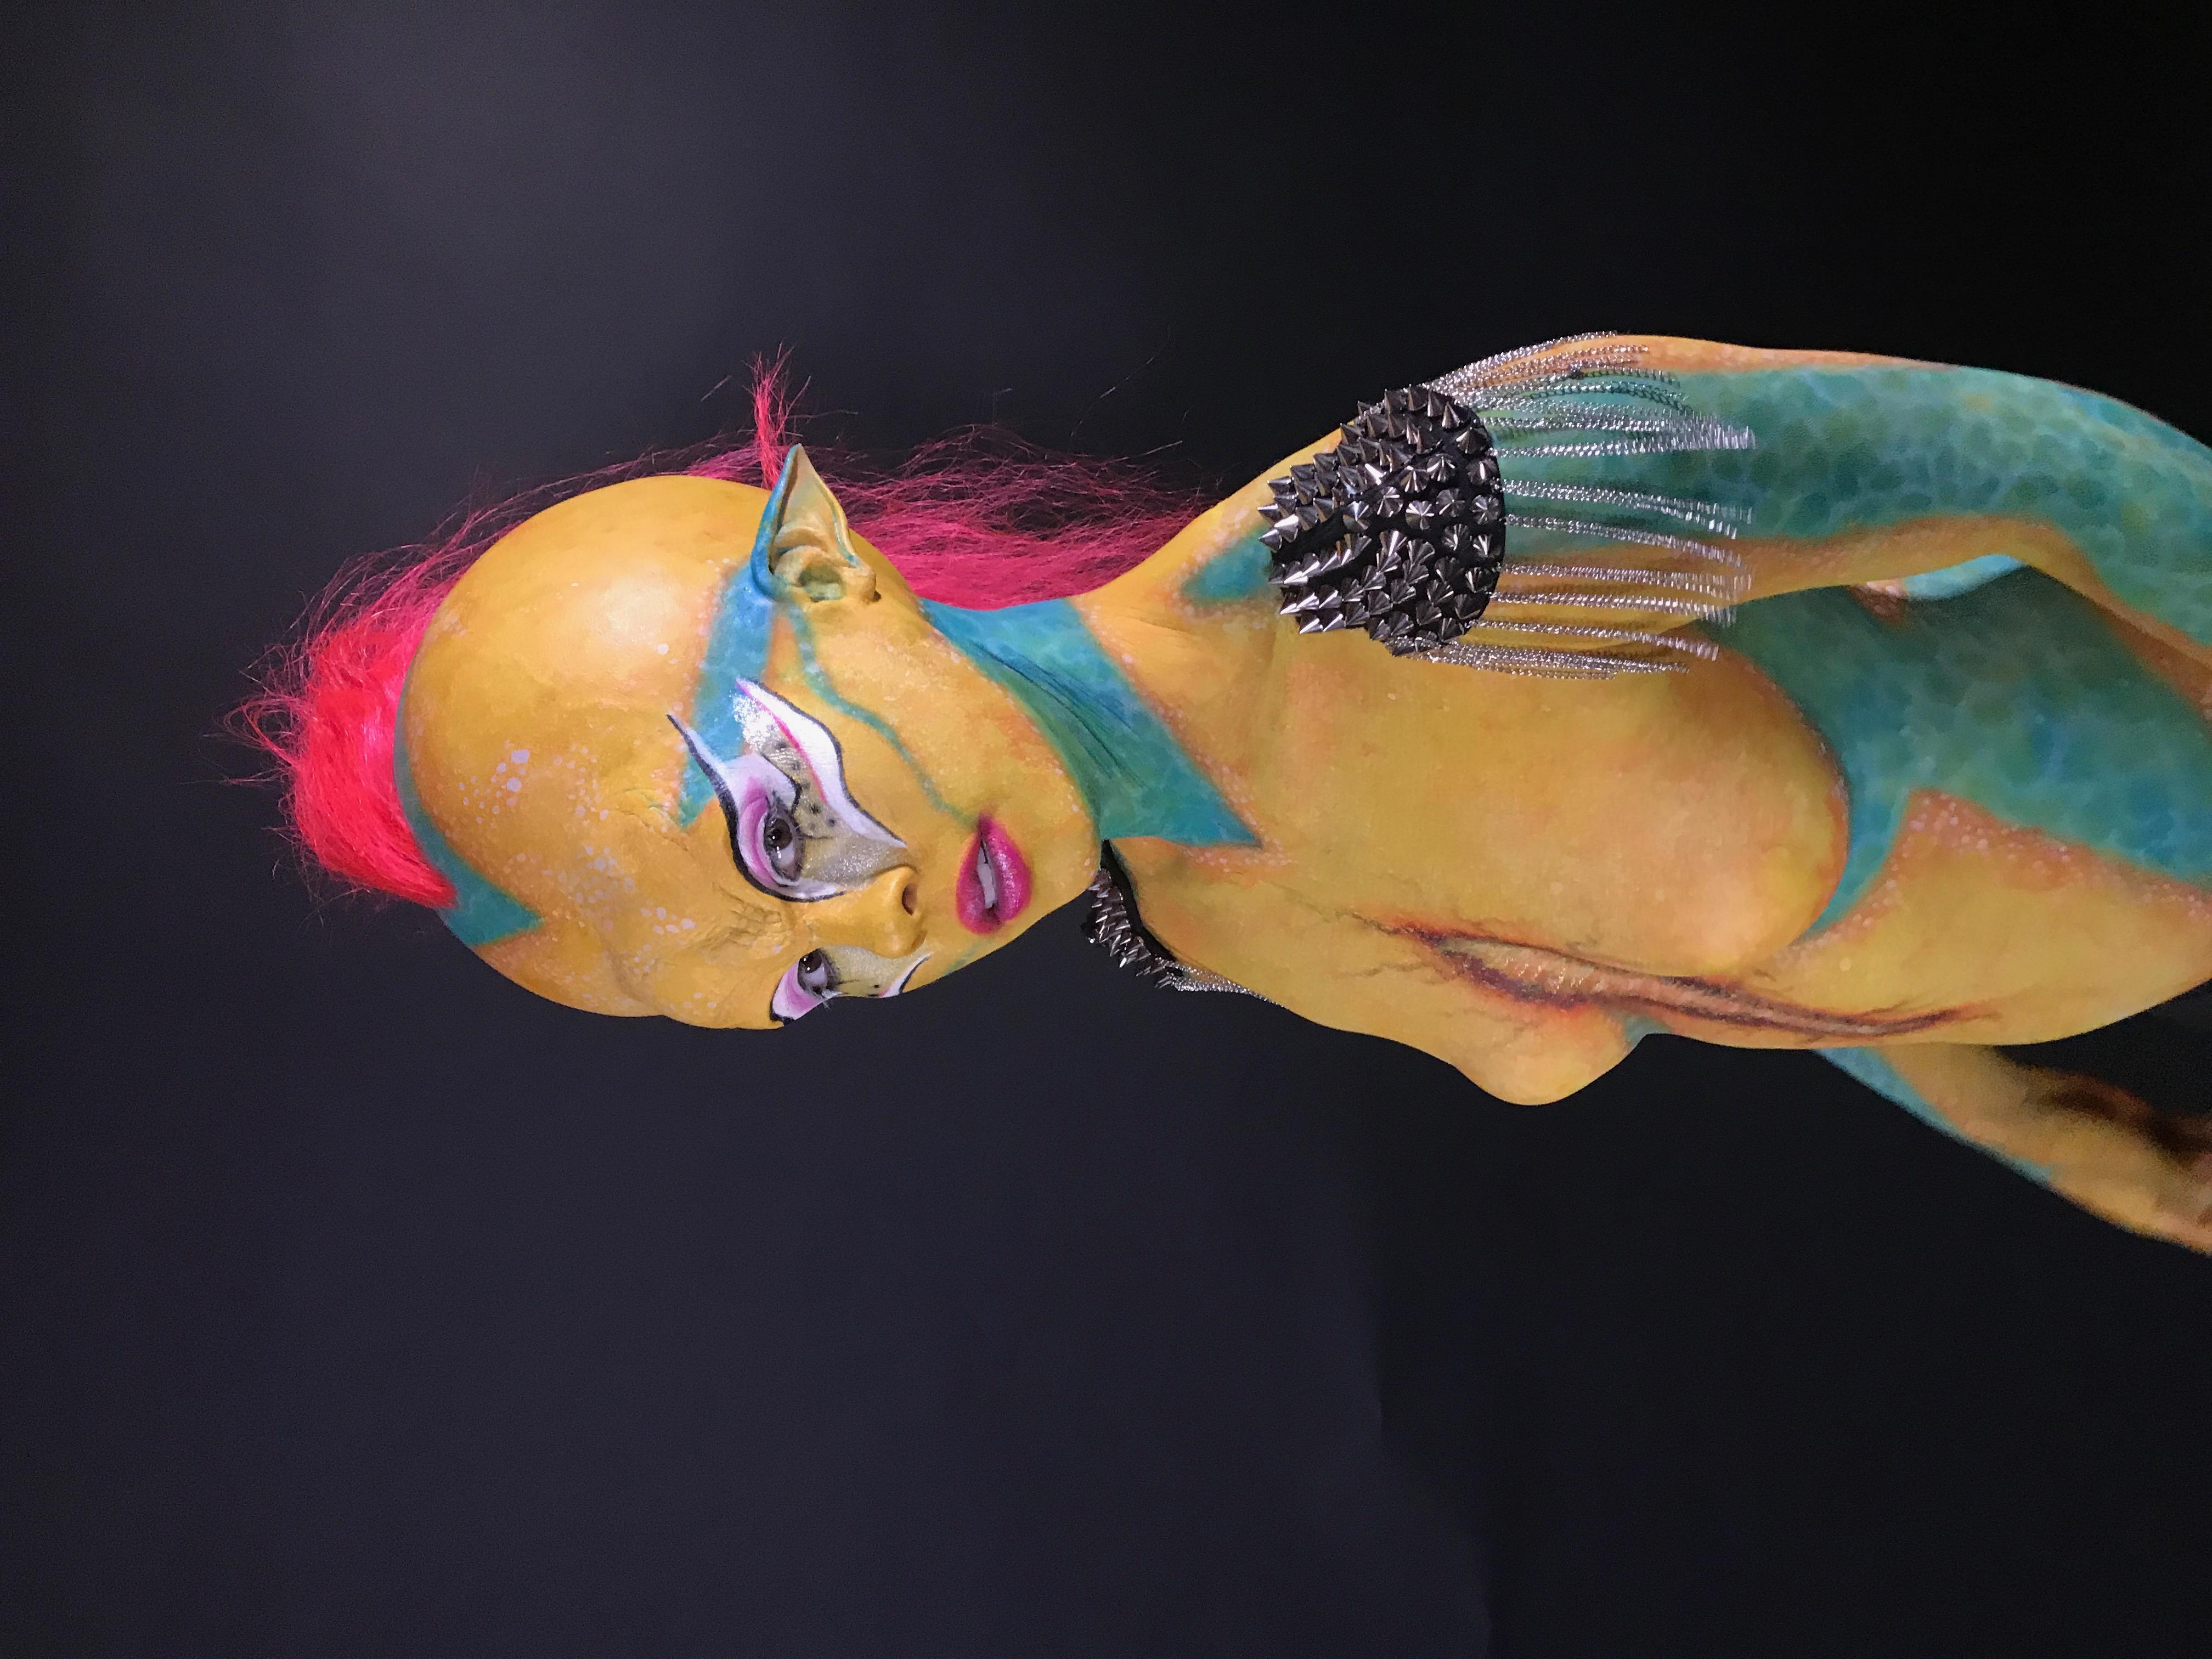 Galaxy Babe by Carleigh Herbert